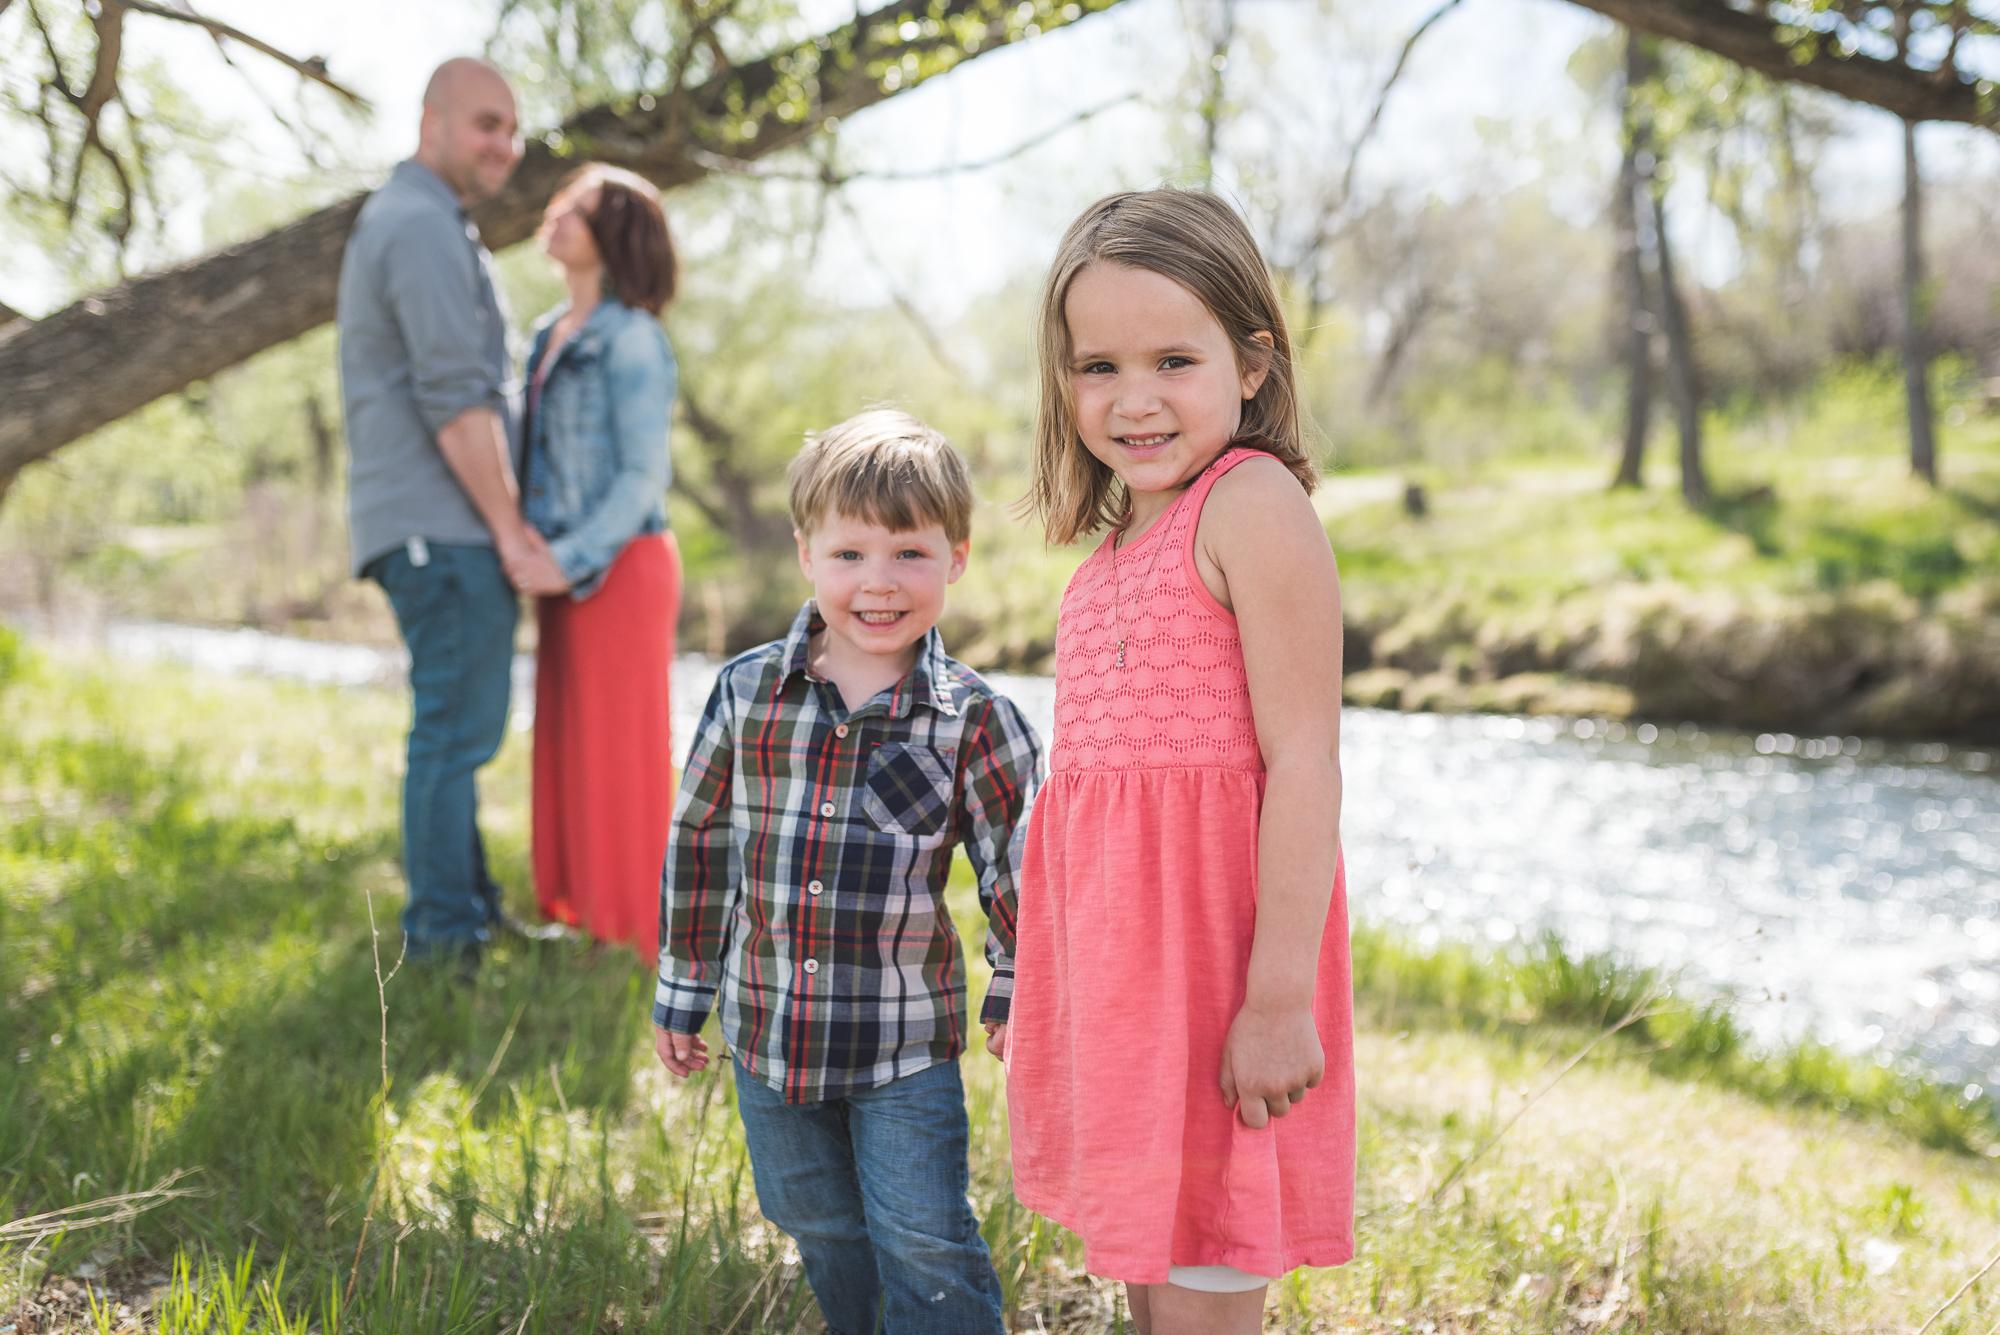 Denver+Boulder+Lifestyle+Family+Photographer+MiniSessions+JennyFolmanPhotography-8.jpg